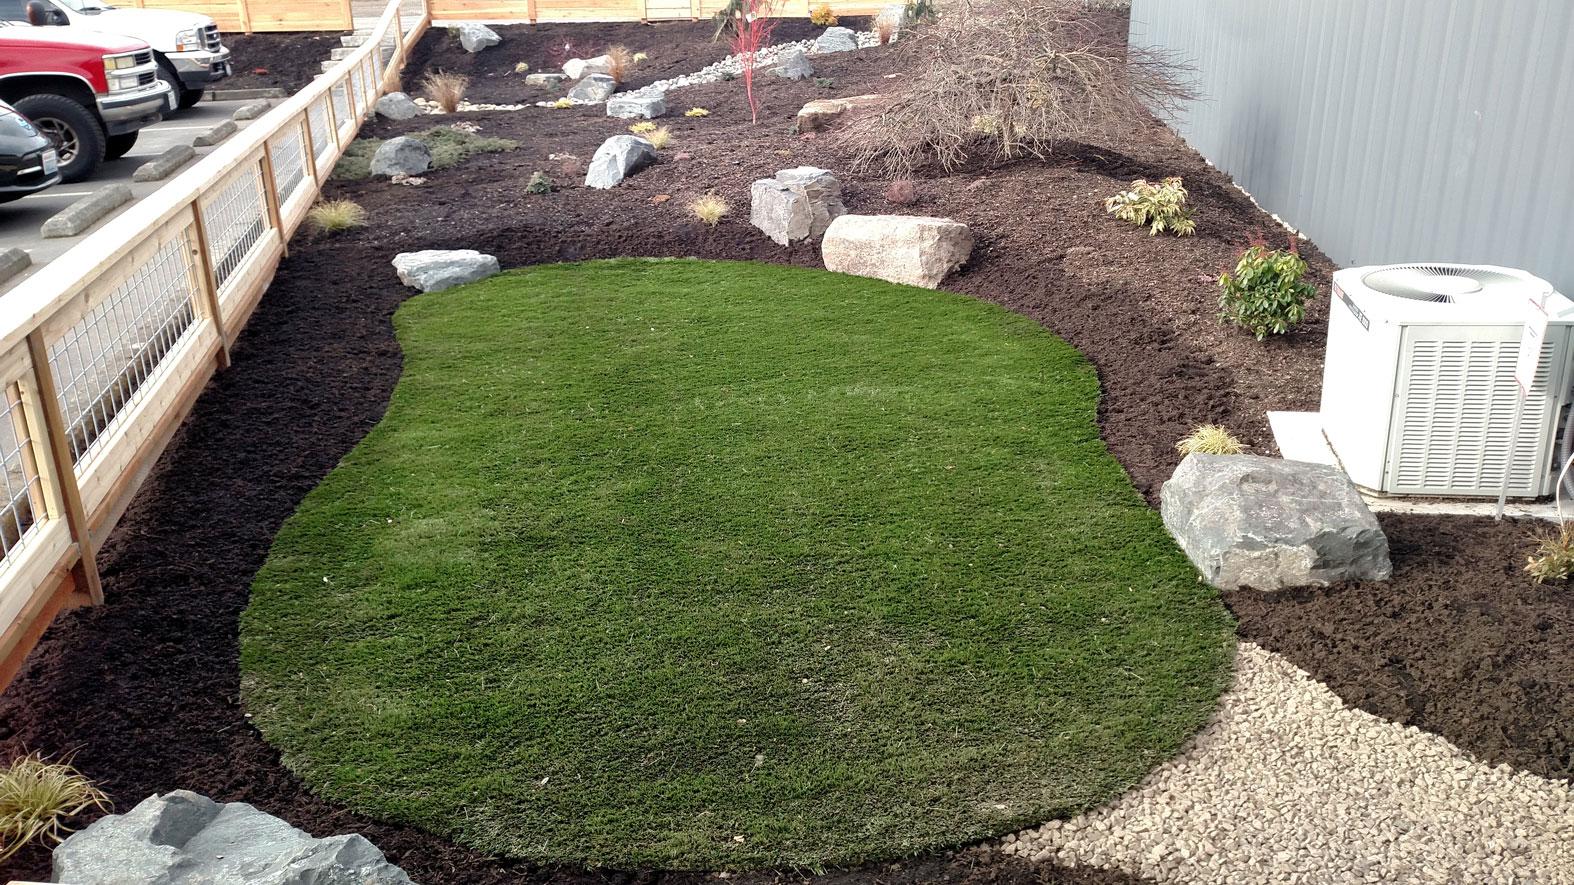 Commercial landscaping bremerton brookside landscape for Landscaping rocks kitsap county